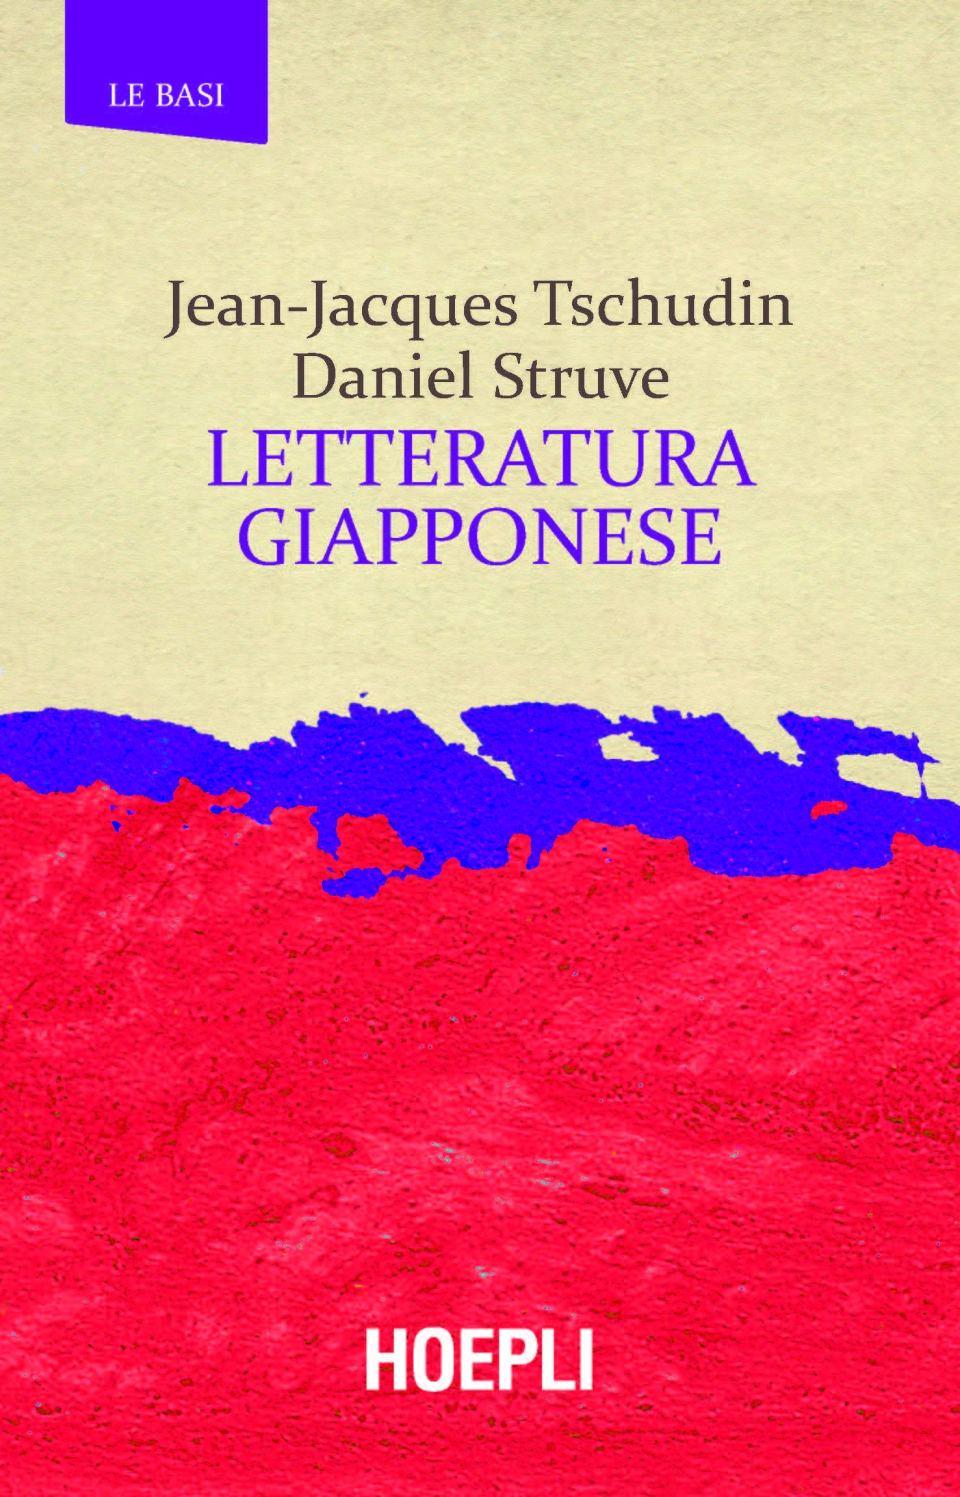 Letteratura Giapponese Book Cover